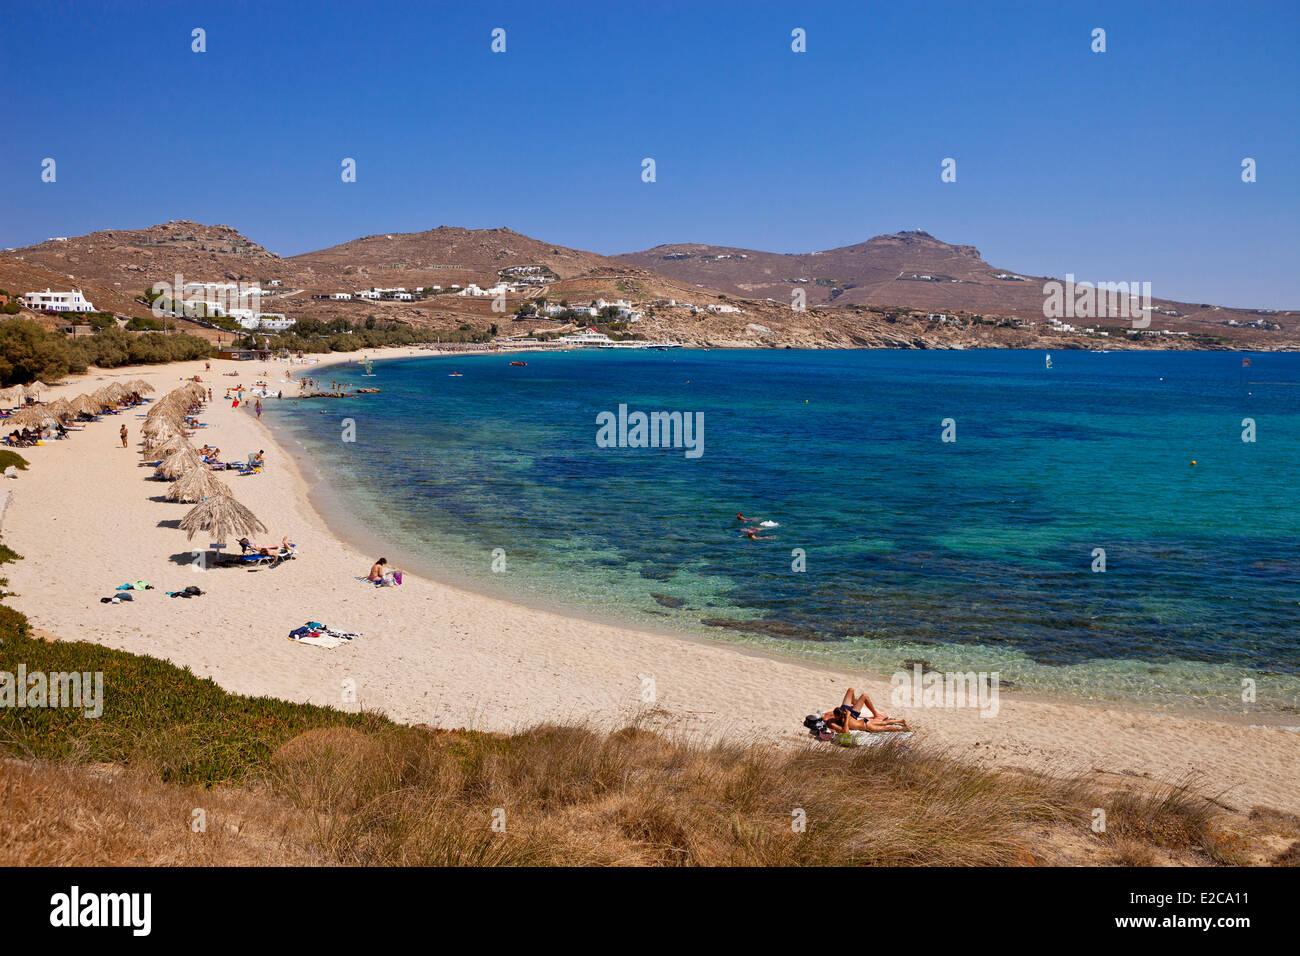 Greece, Cyclades, Mykonos Island, Kalafatis beach - Stock Image